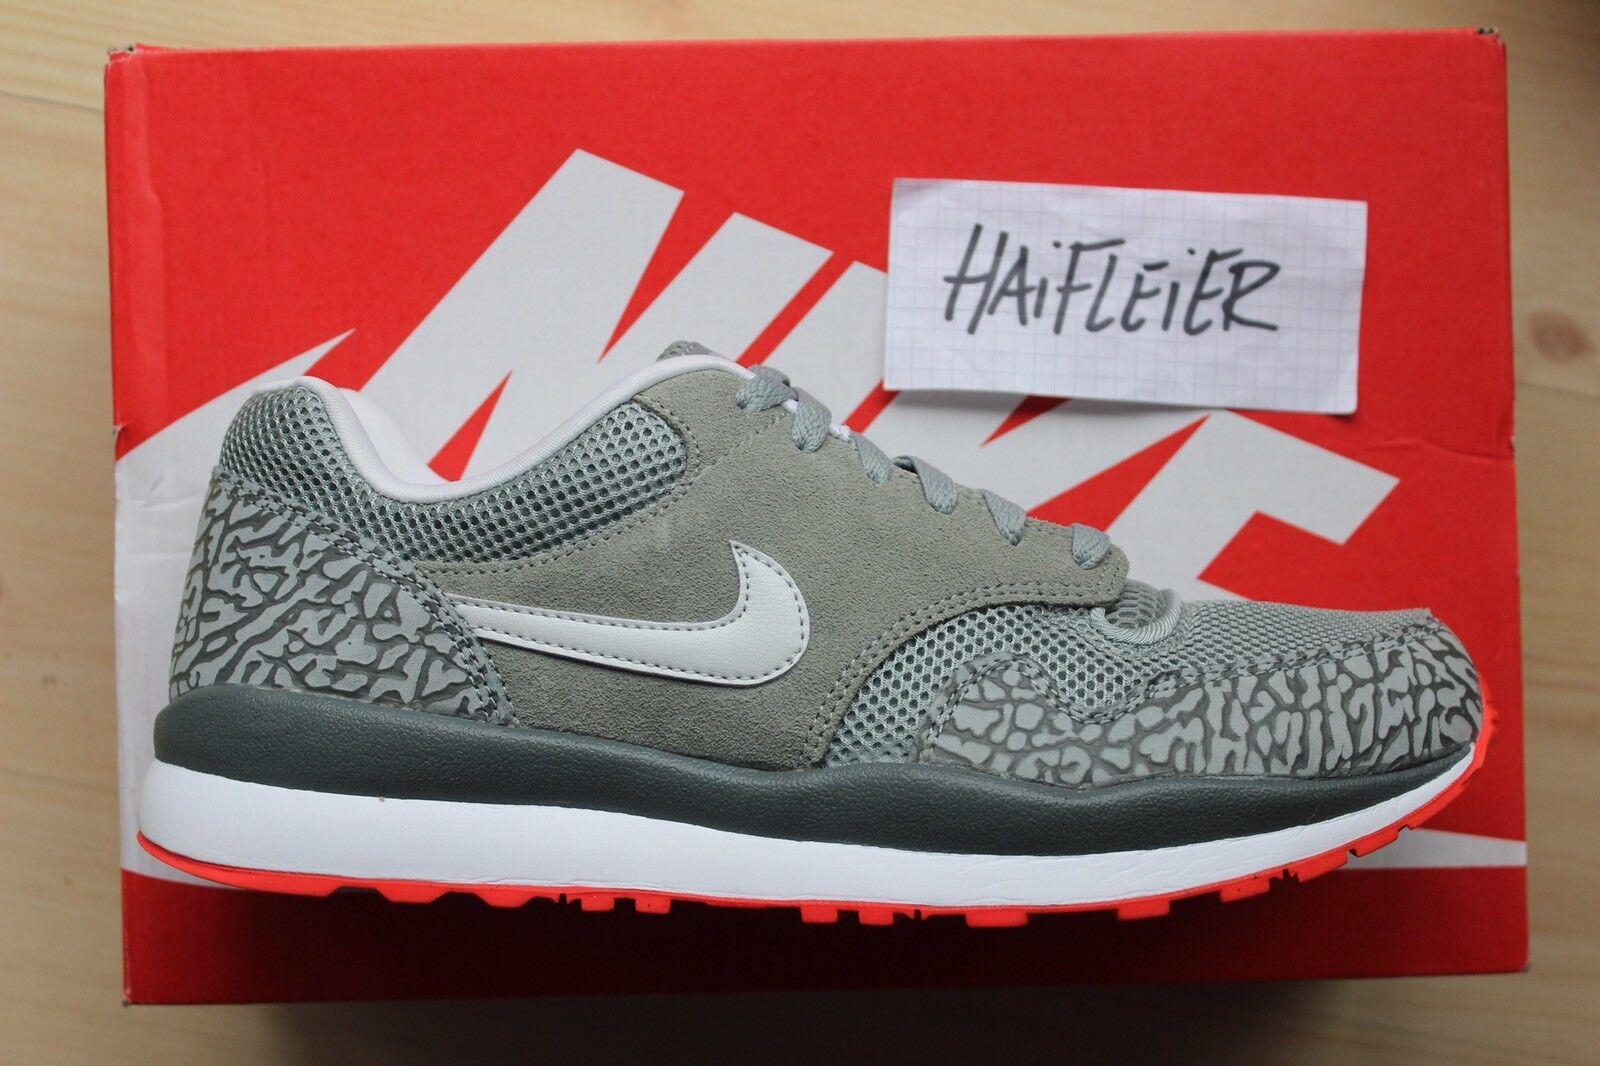 Nike Air Safari / Gr. US 10.5 / NEU / 371740 302